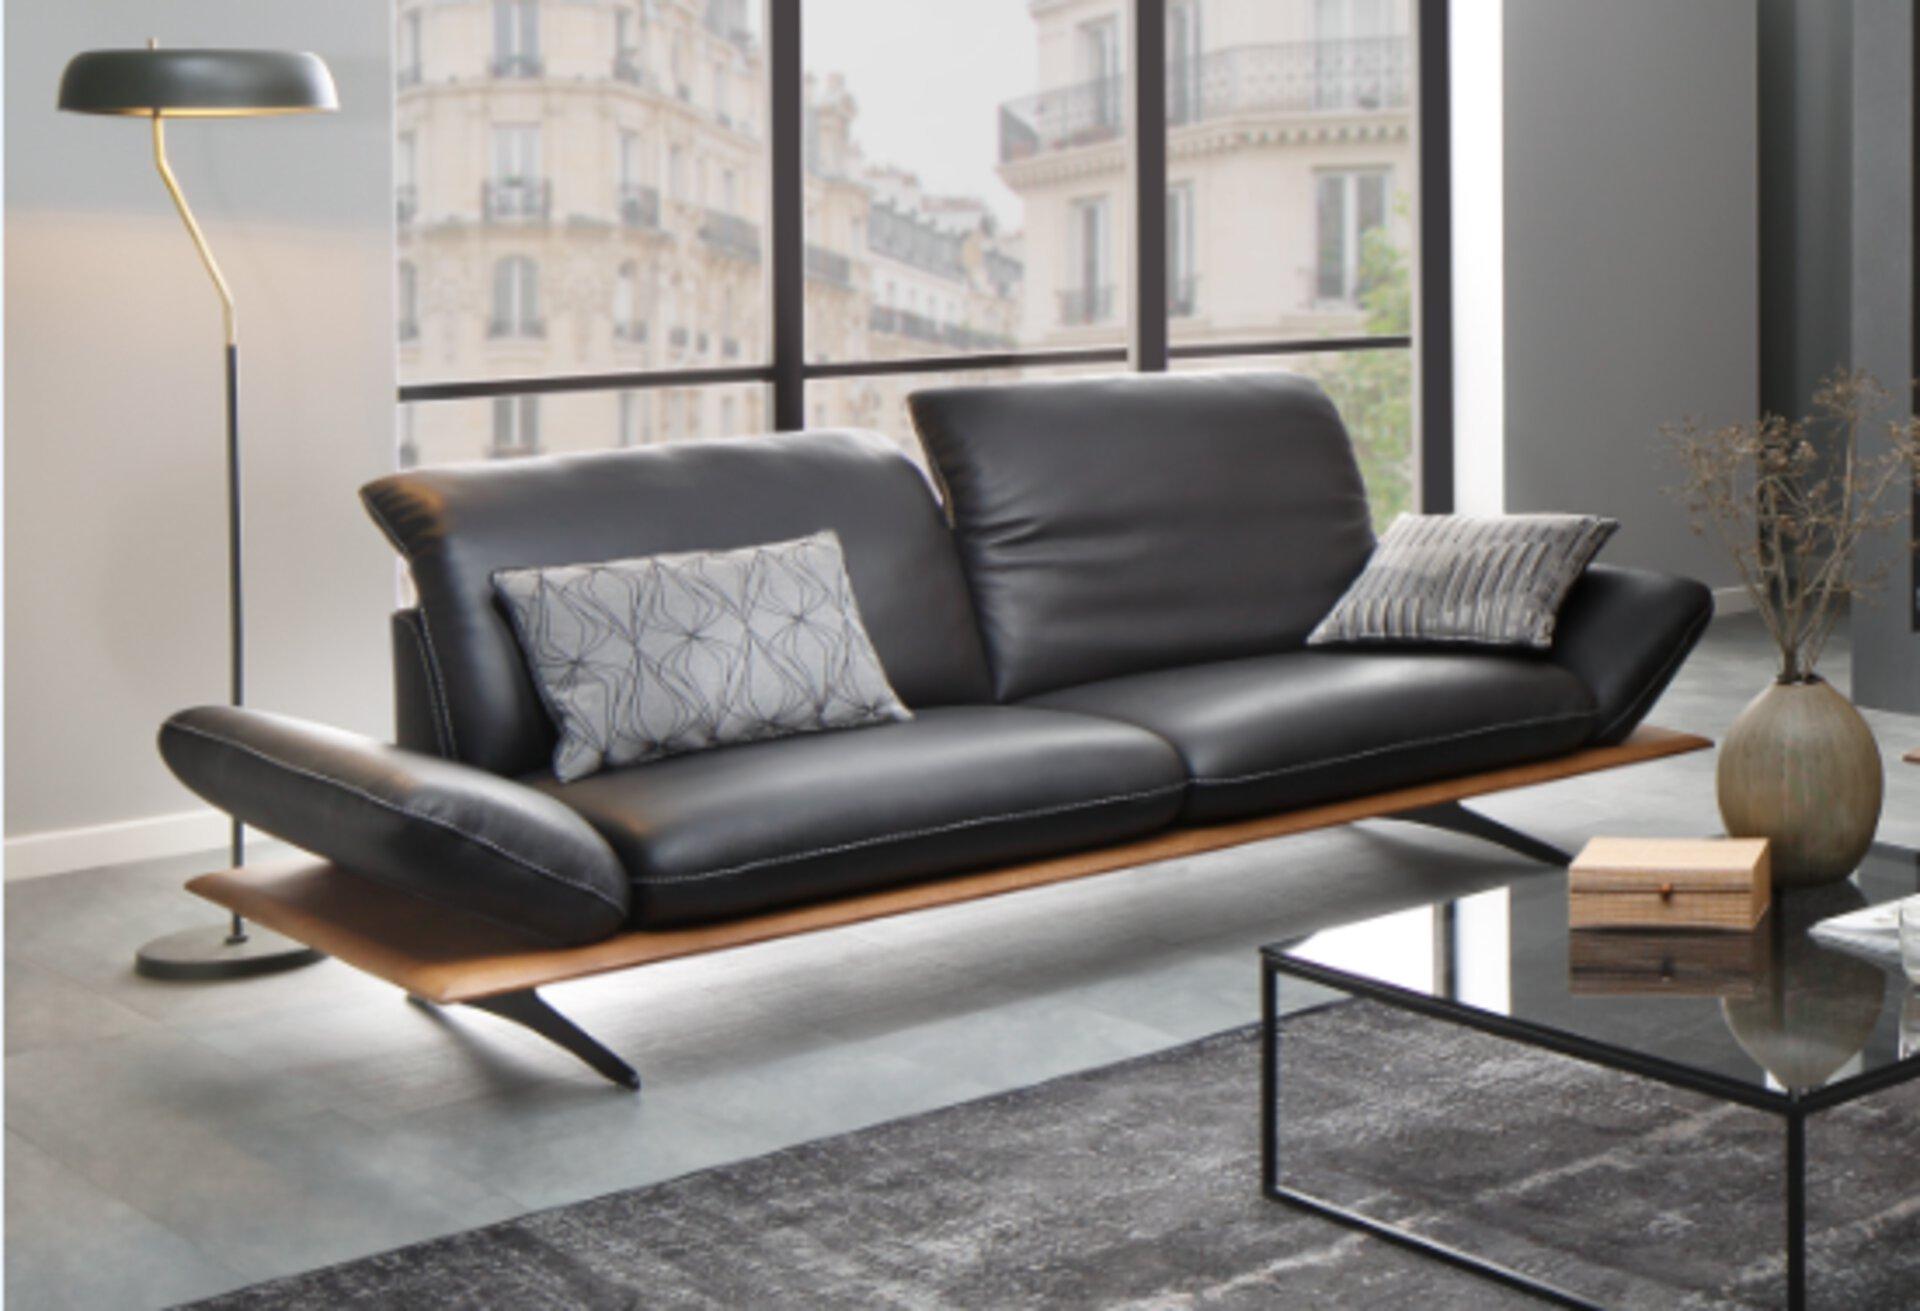 Sofa 2,5-Sitzer 27620 W.Schillig Leder 110 x 82 x 240 cm